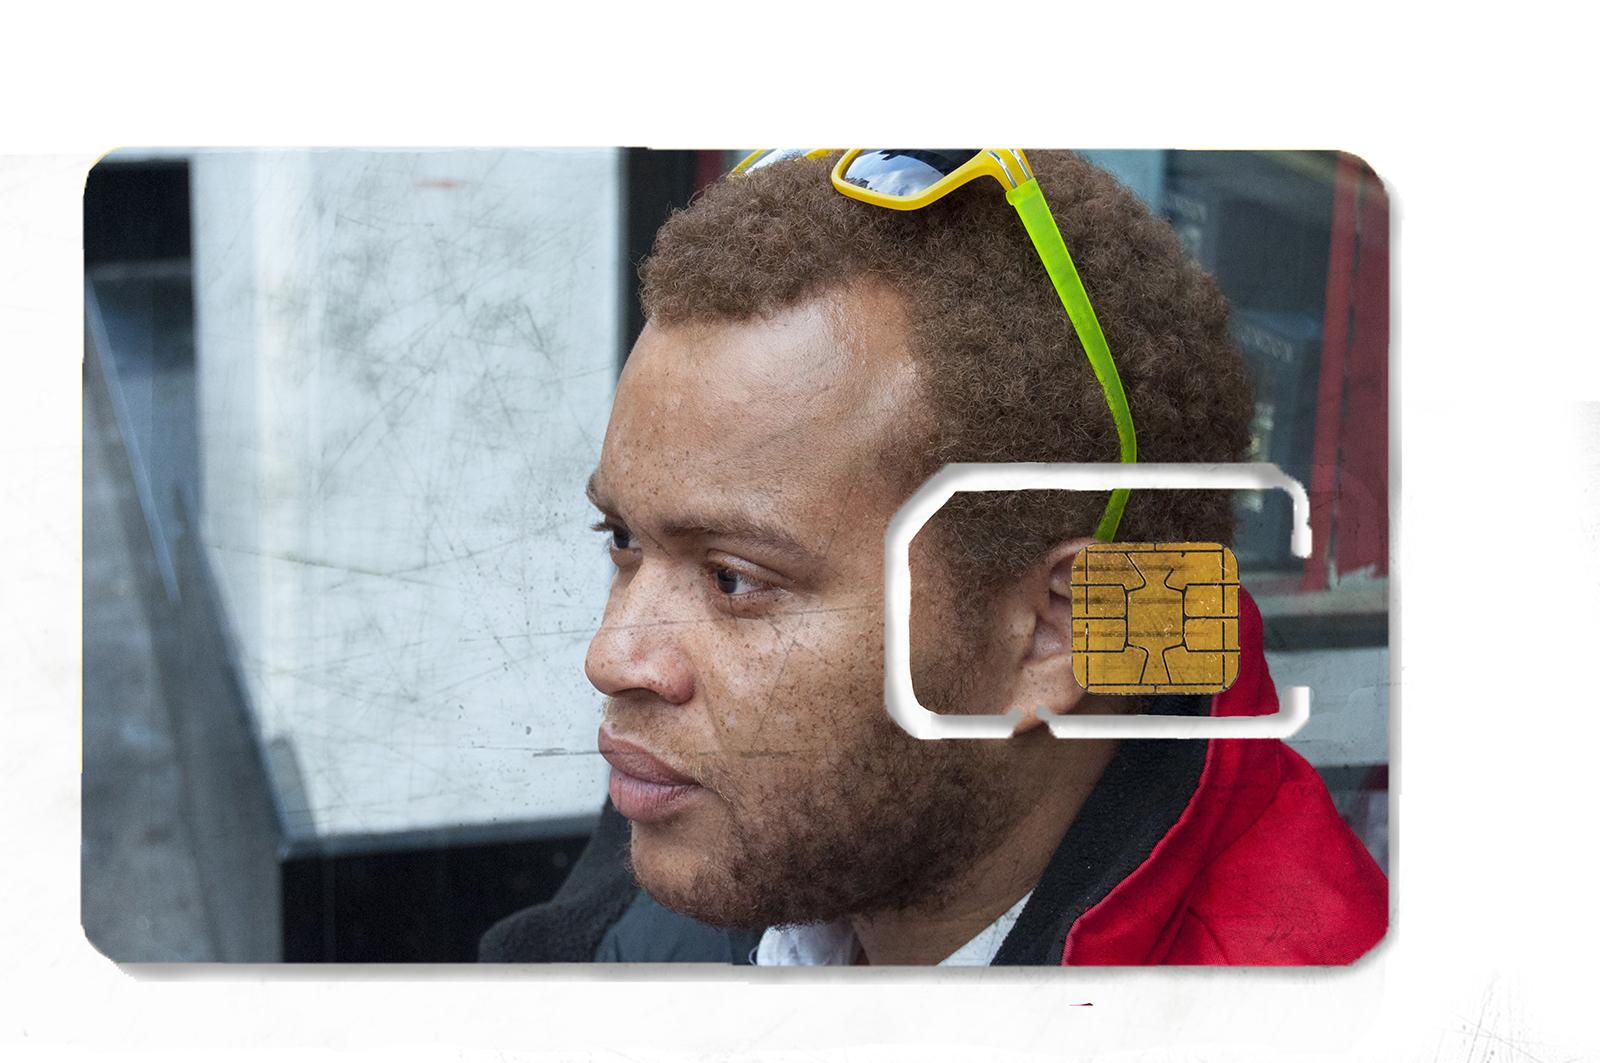 Photograph printed on sim card